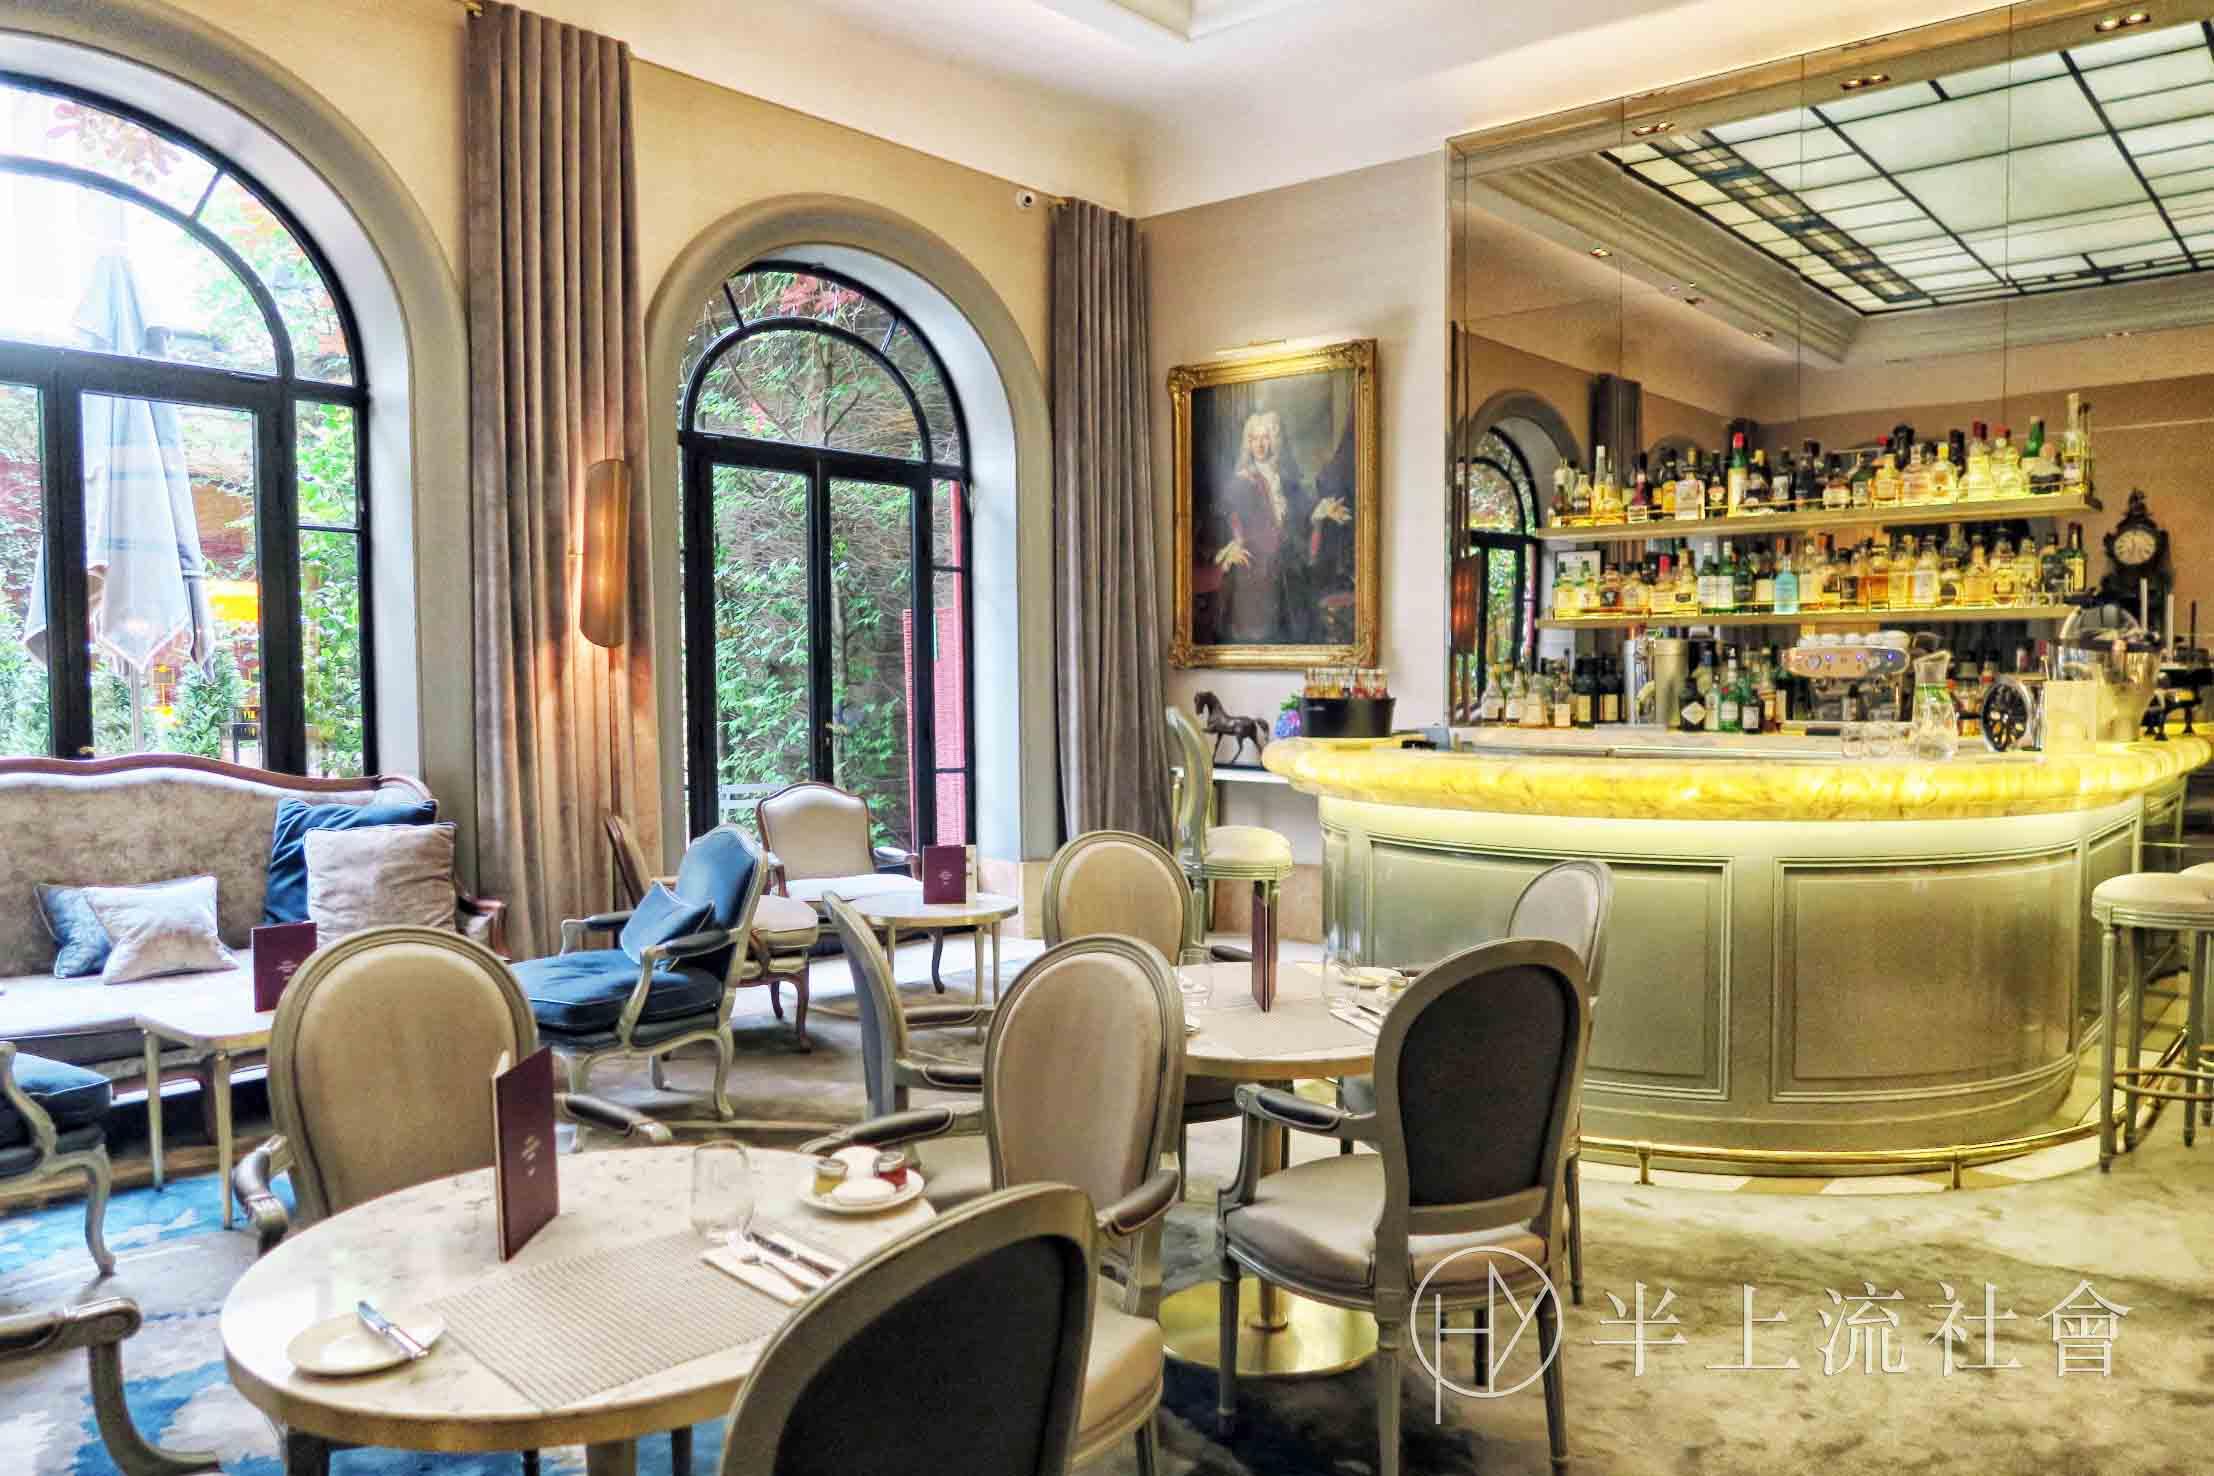 Fine Dining 完全指南:美食家詞彙教學,從法國角度談精緻餐飲內涵價值,Bistronomy、Fusion、Haute gastronomie 差異